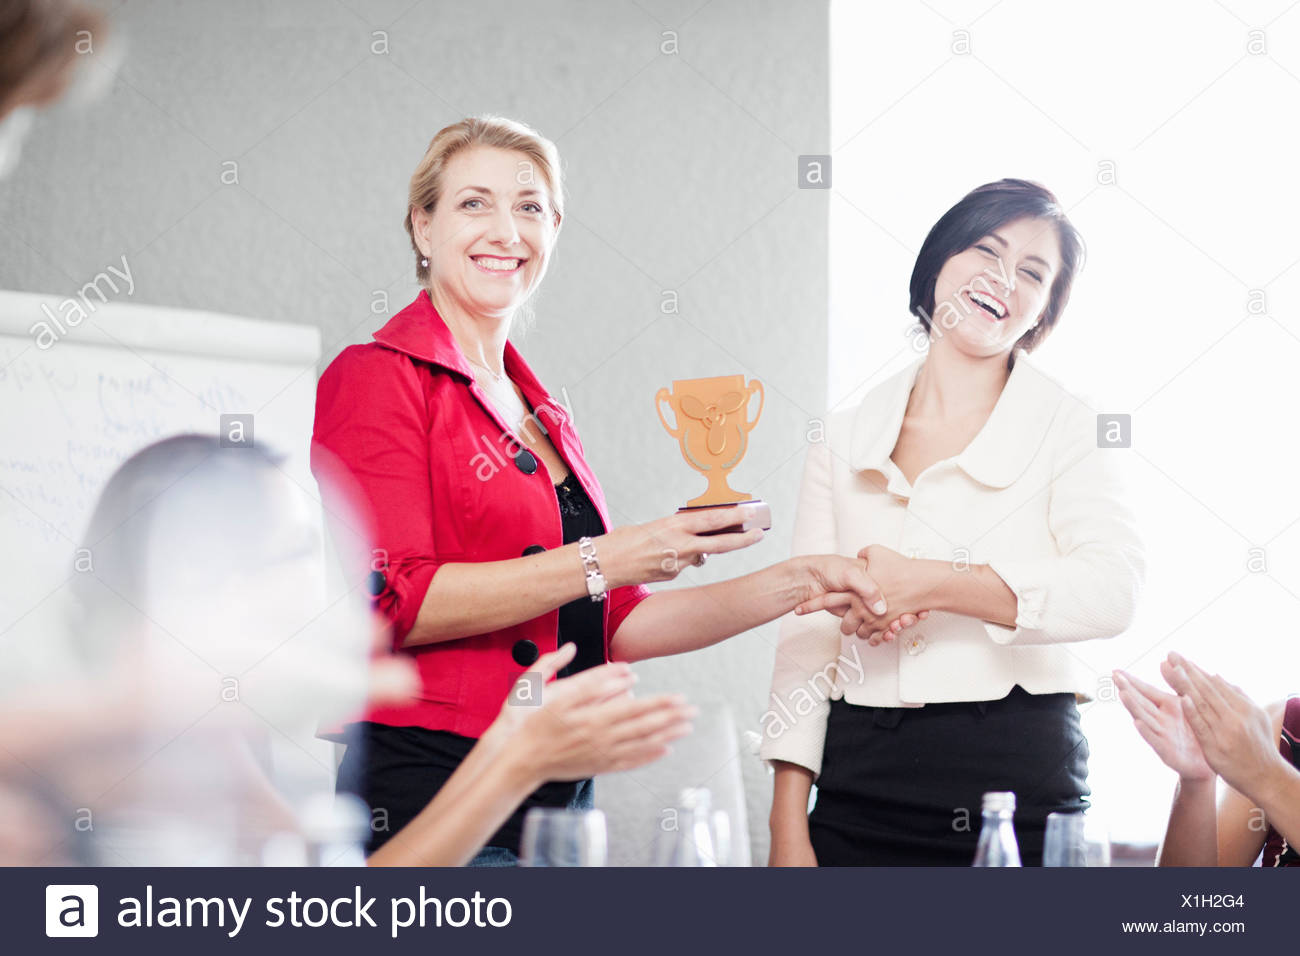 Businesswoman receiving award - Stock Image